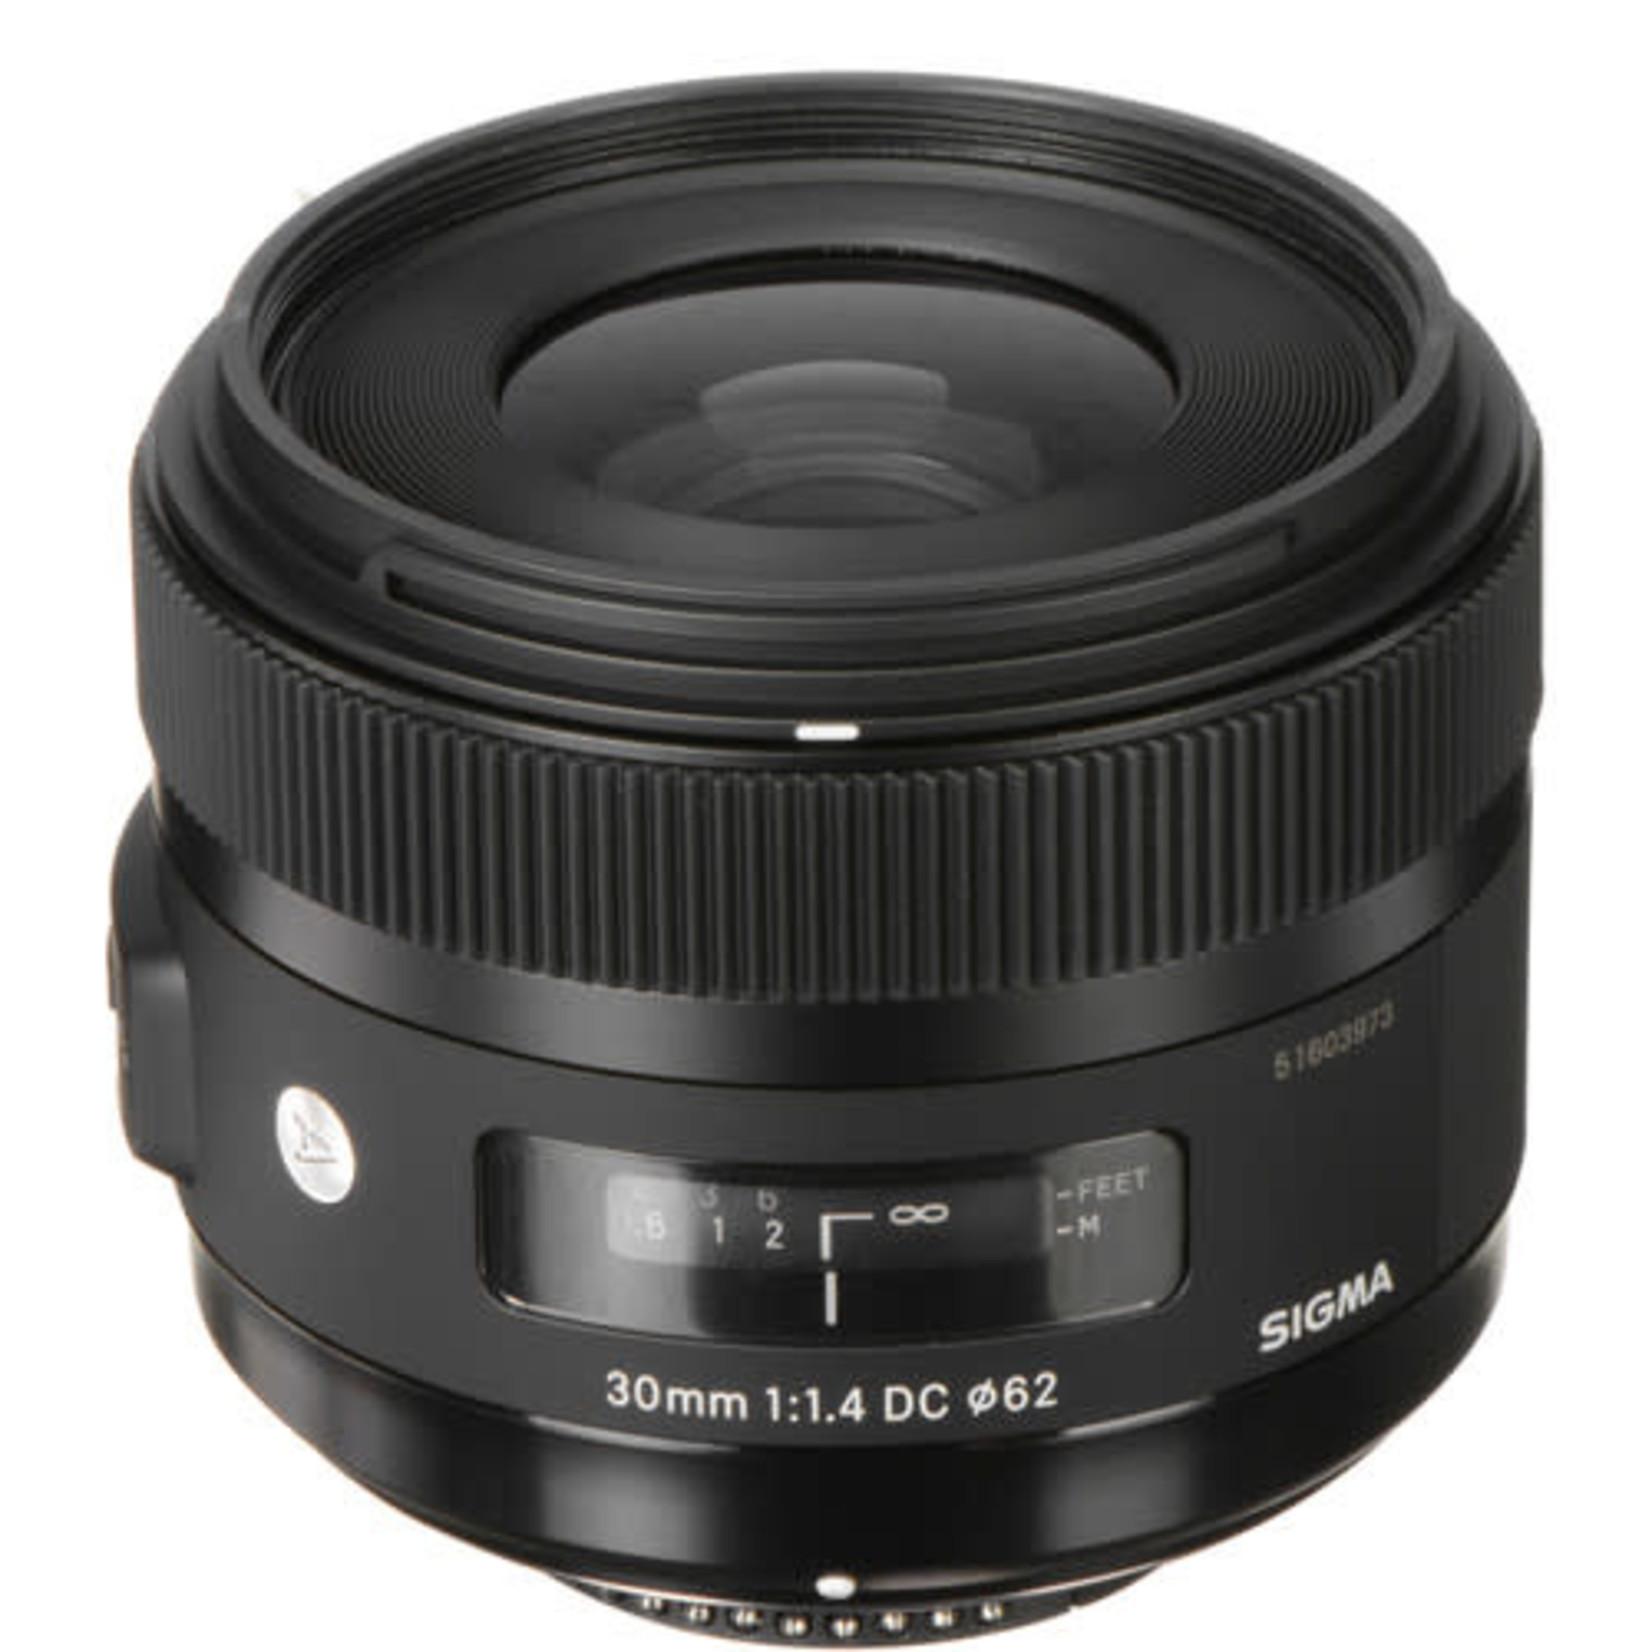 Sigma Sigma 30mm f/1.4 DC HSM Art Lens for Nikon F